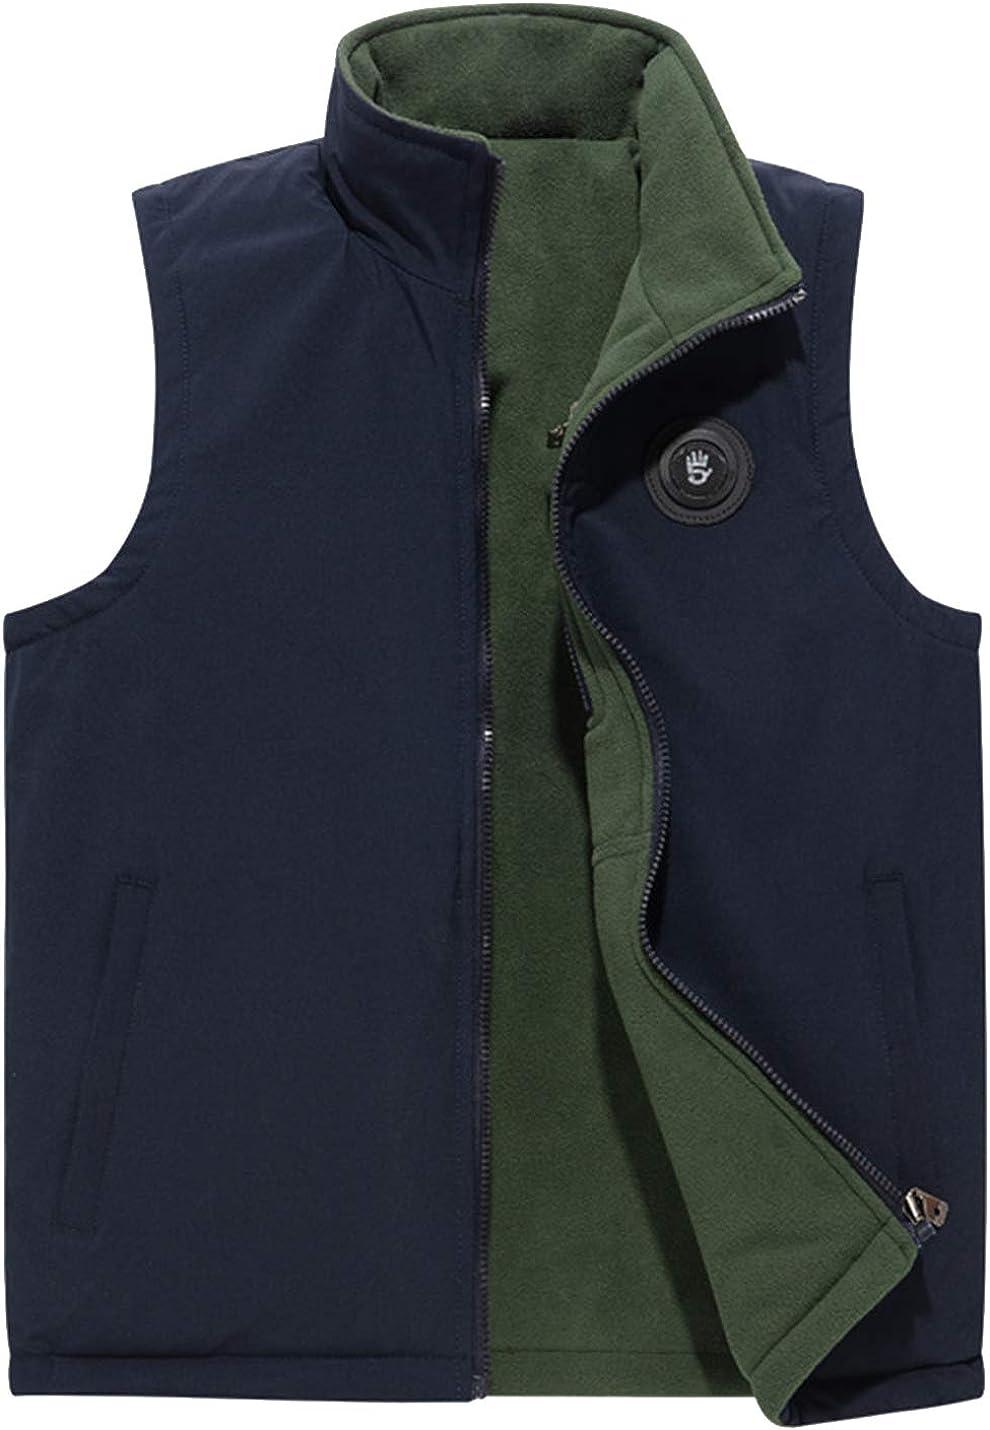 Flygo Men's Reversible Lightweight Softshell Vest Zip up Fleece Lined Outdoor Padded Vest Sleeveless Jacket